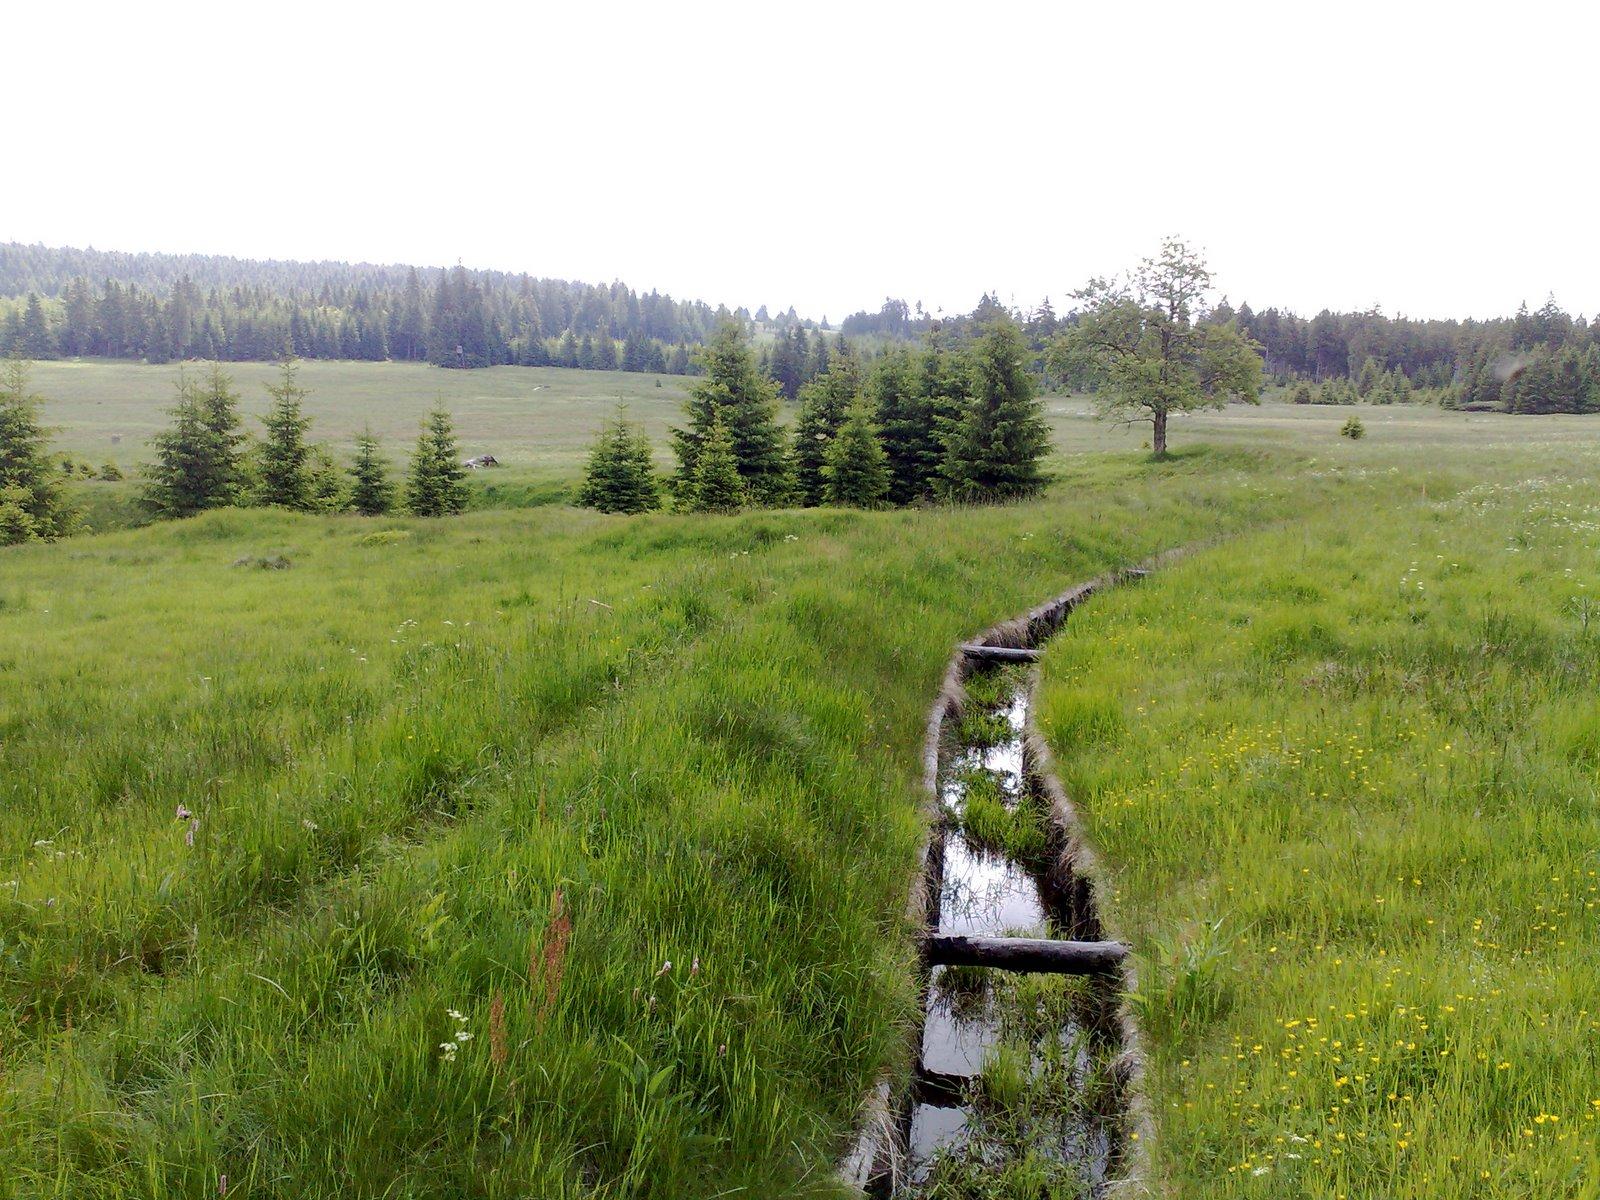 de Blatenský waterloop